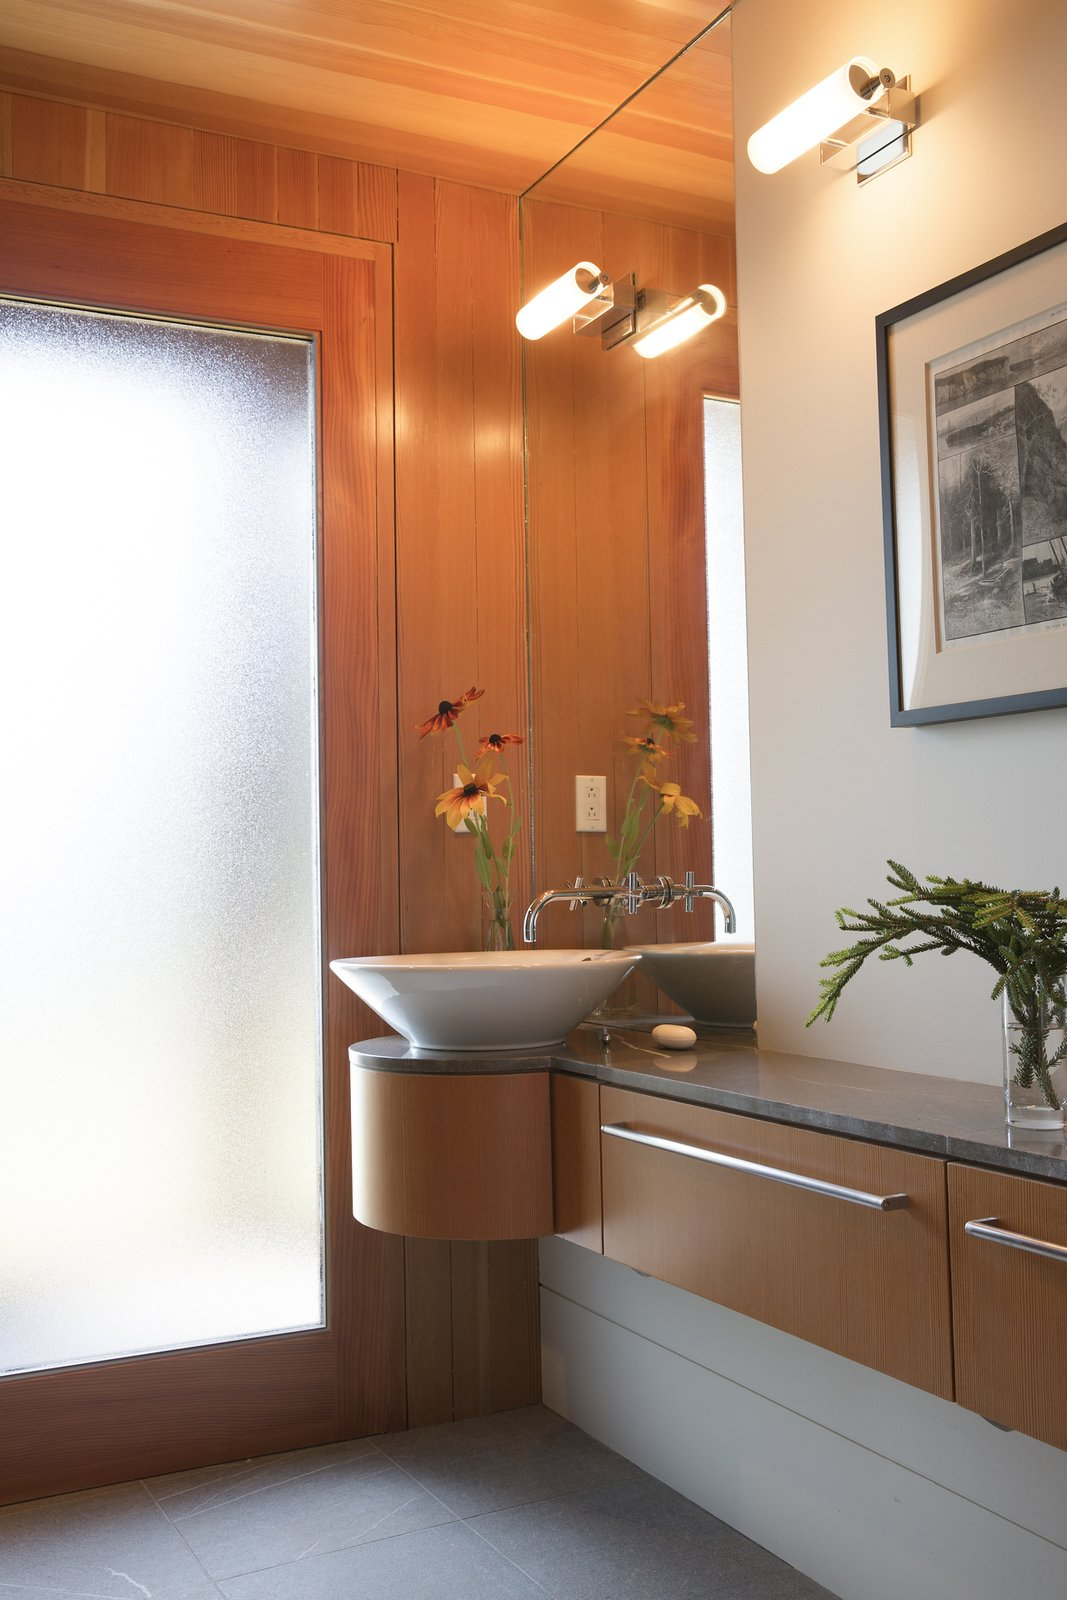 Bath Room, Granite Counter, Limestone Floor, Vessel Sink, Open Shower, Wall Lighting, Ceiling Lighting, and Two Piece Toilet Powder room  Deep Cove House by Elliott + Elliott Architecture